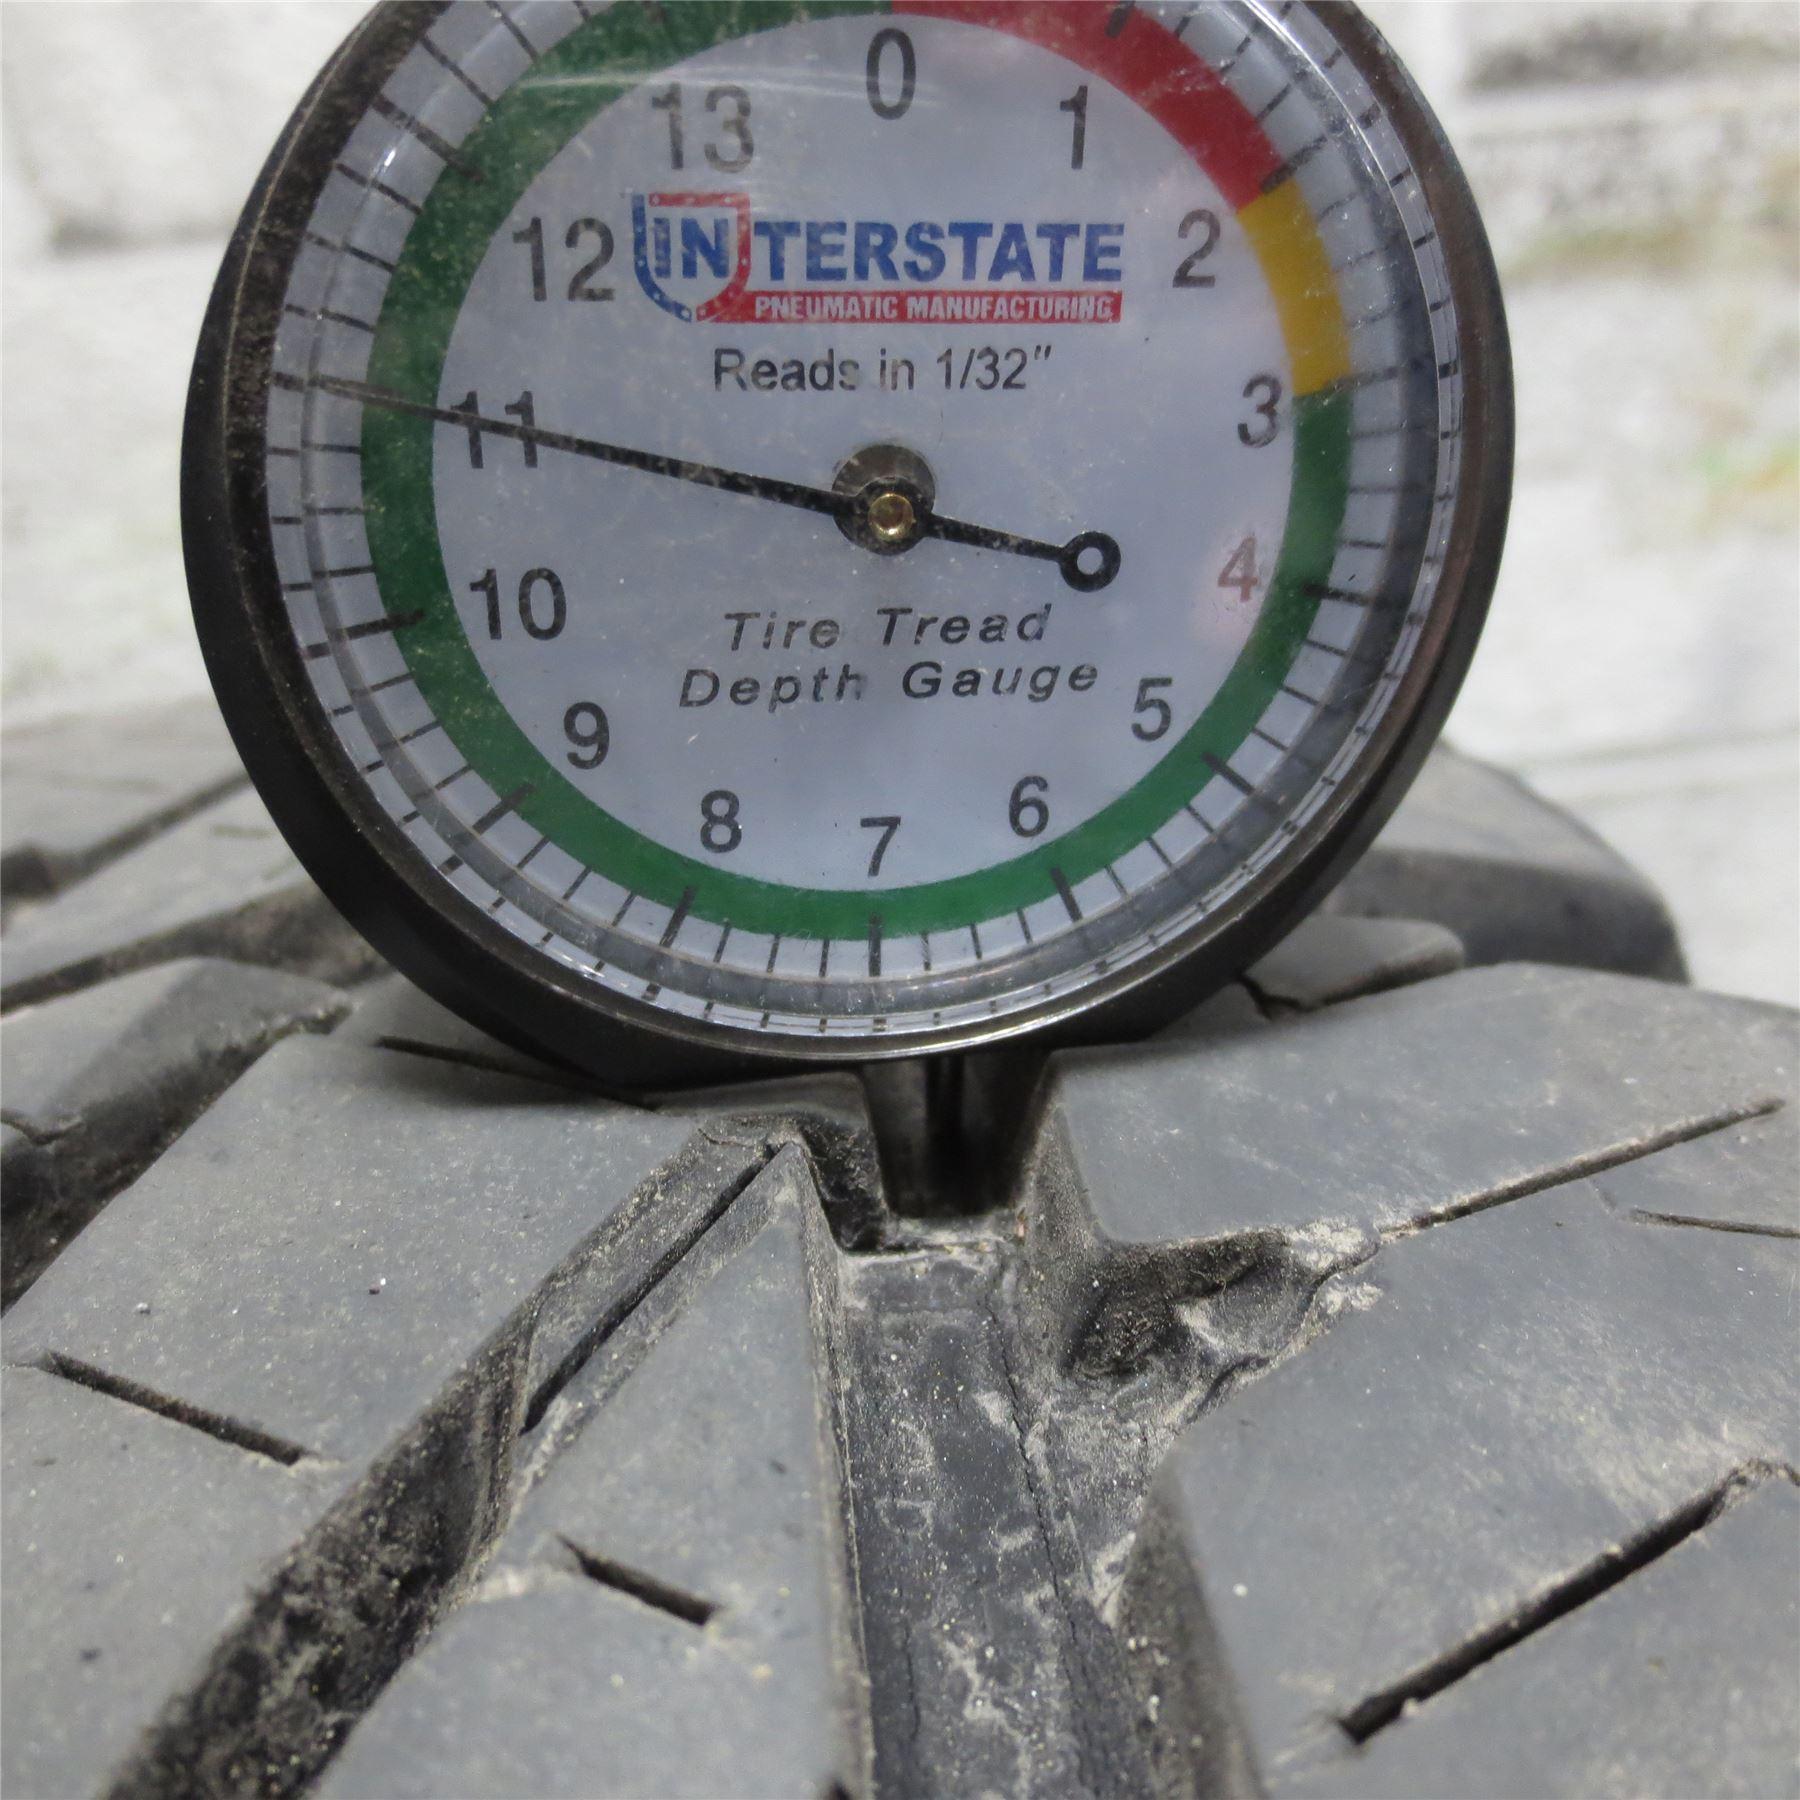 LT275 70R18 Bridgestone DUELER A T REVO 2 125 122S Tire 11 32nd NO